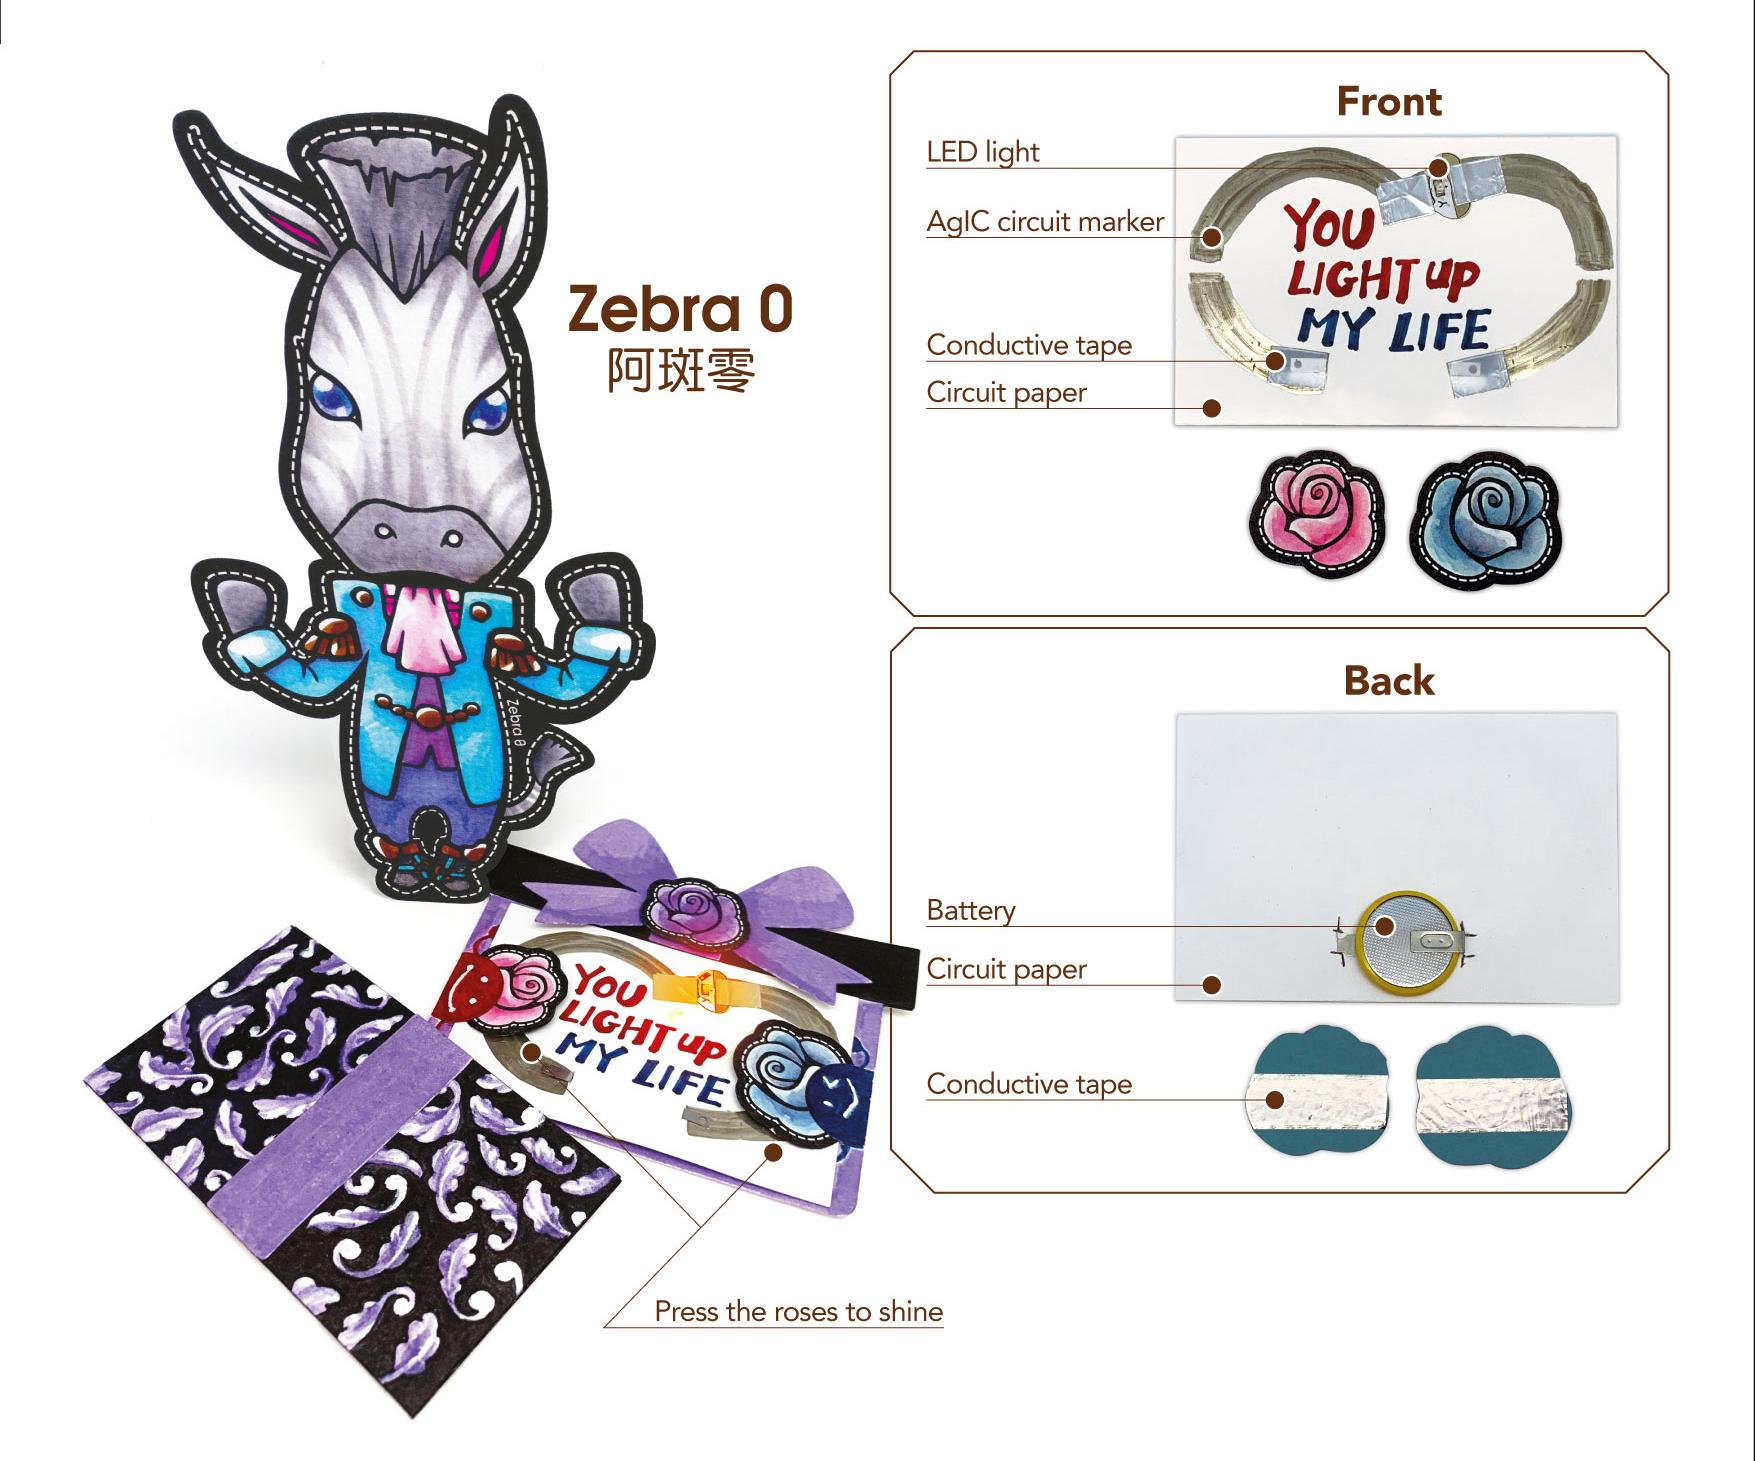 Zebra 0 gift box card set